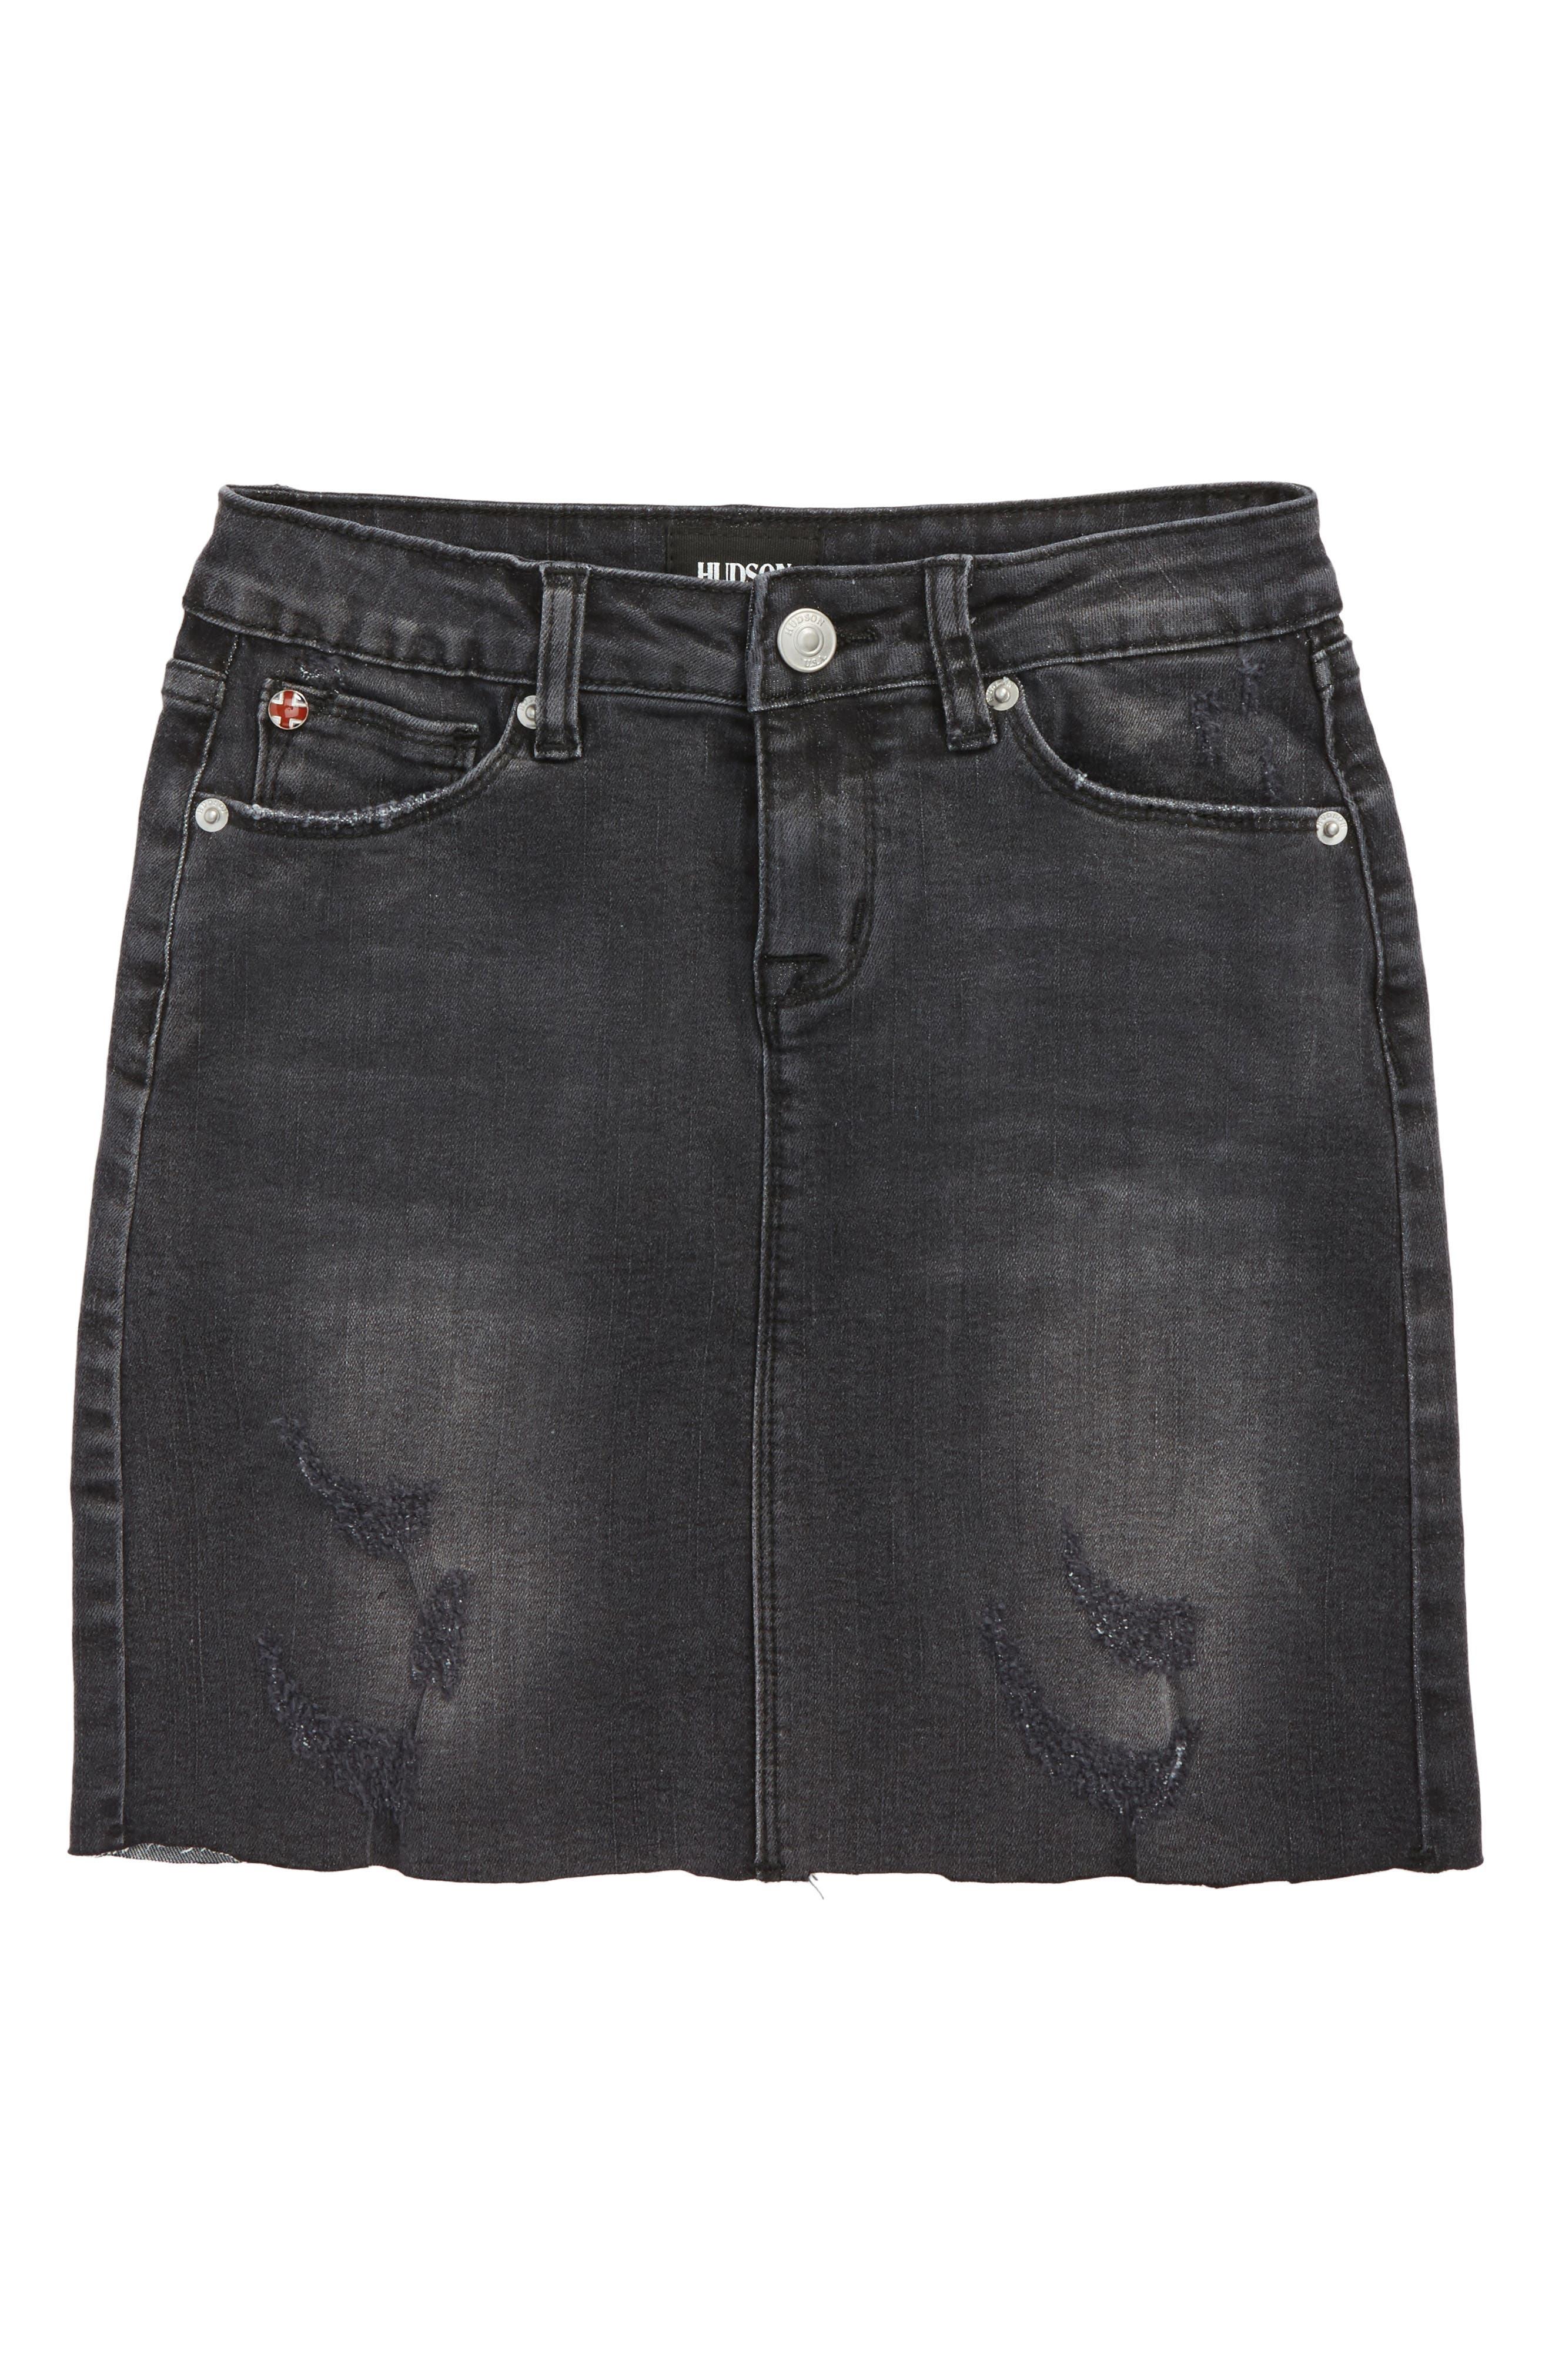 Tara Cutoff Denim Skirt,                             Main thumbnail 1, color,                             001